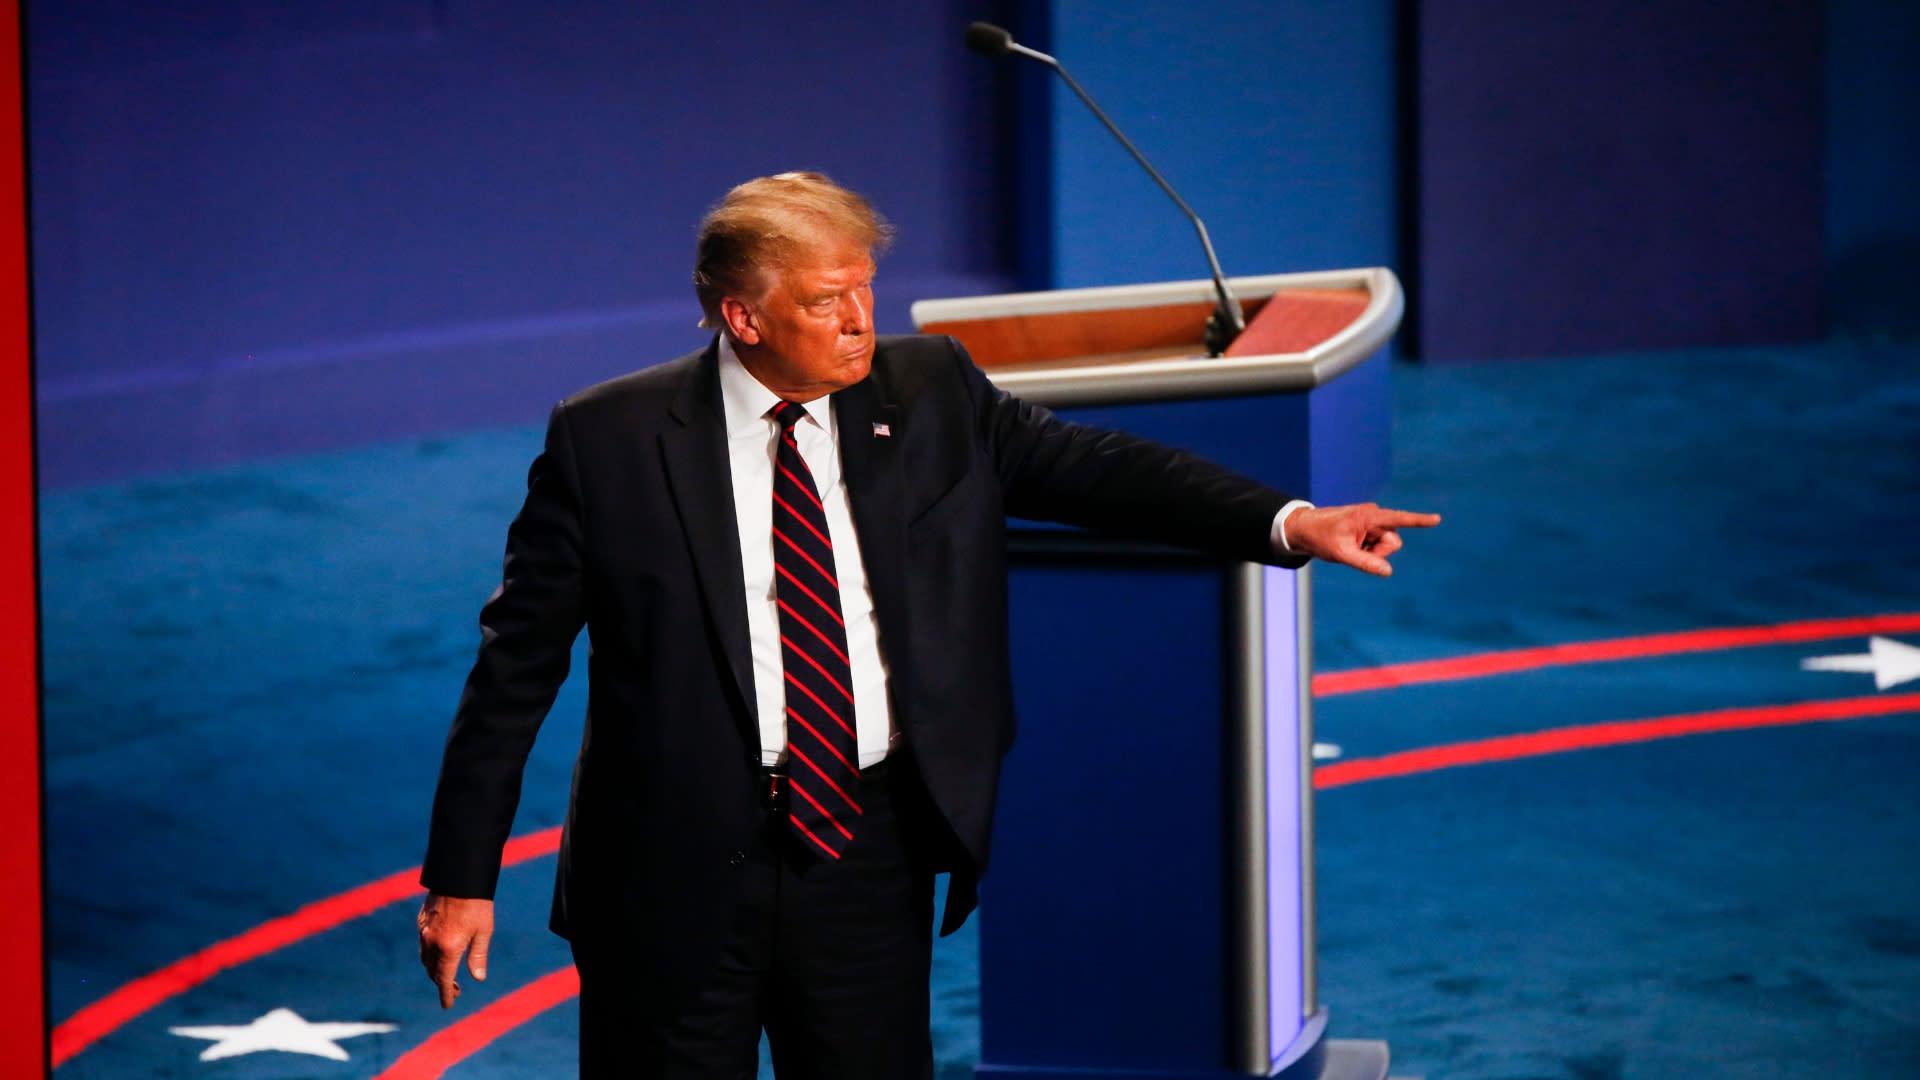 President Donald Trump says he 'brought back Big Ten football' during debate